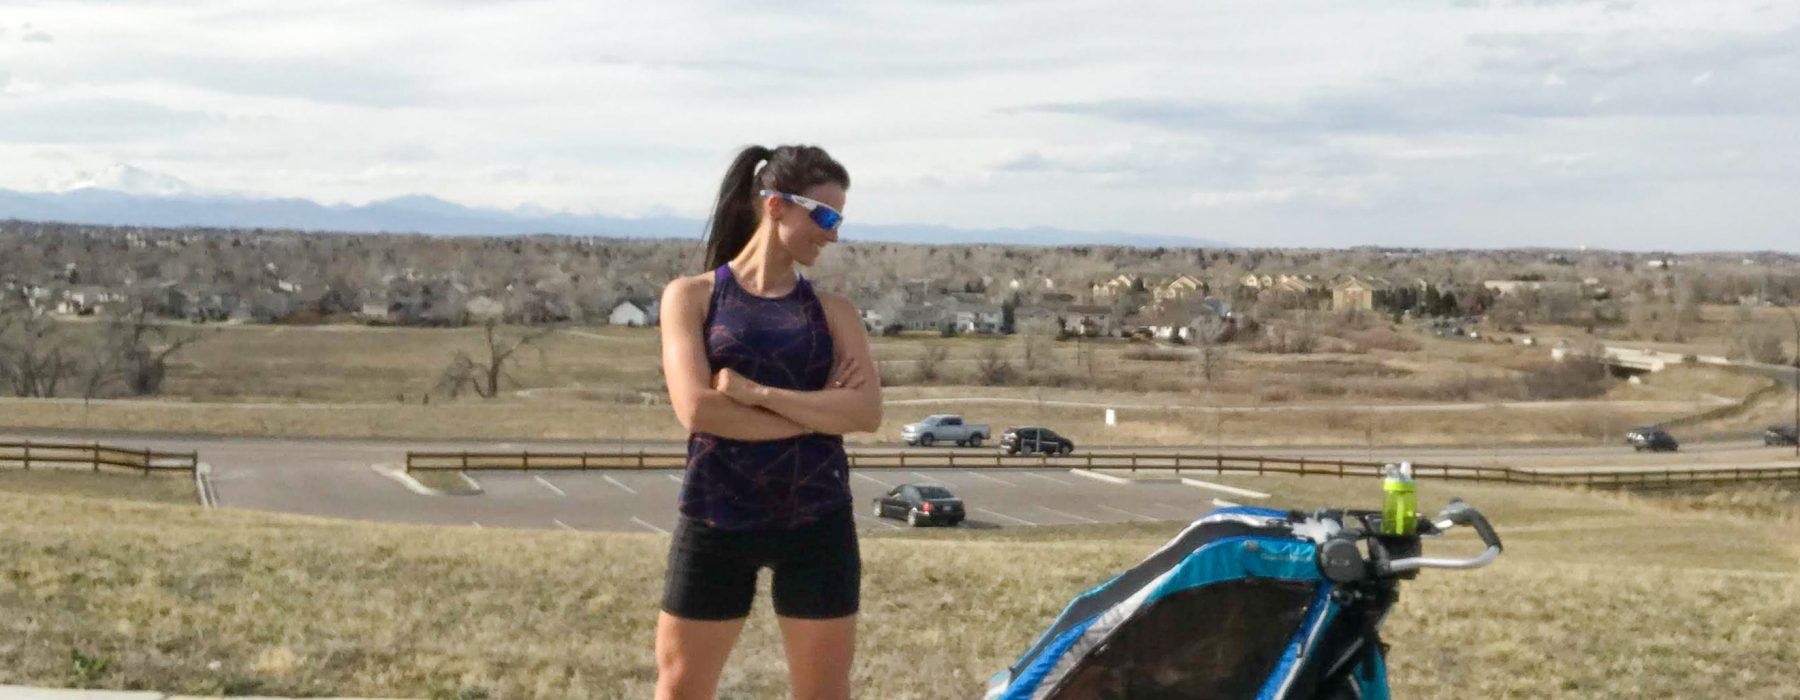 triathlon po ciąży